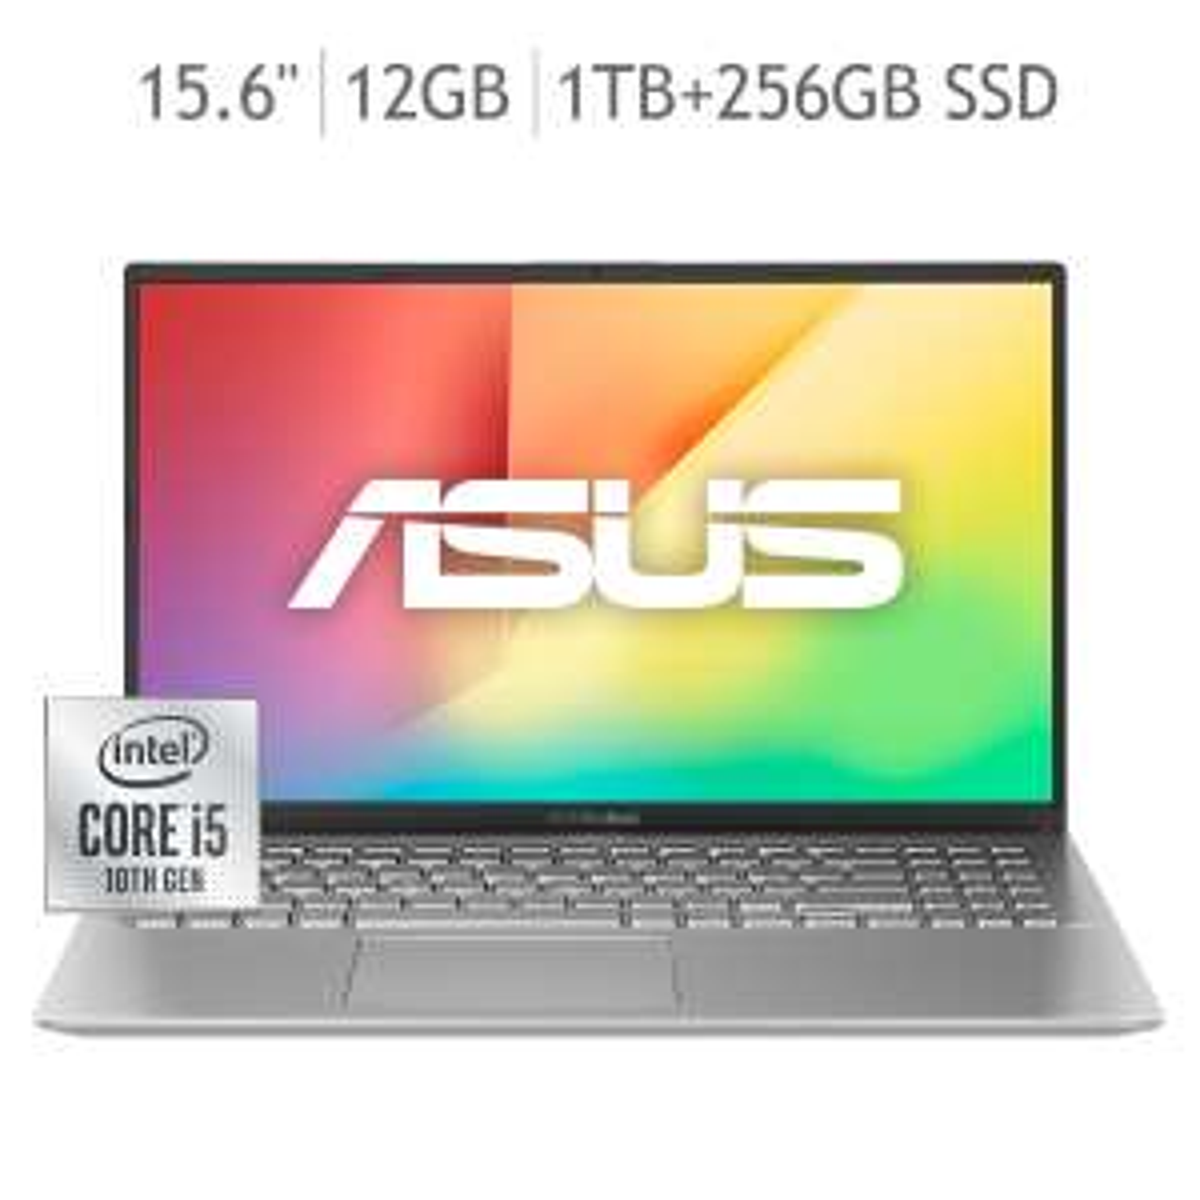 "Costco: Asus VivoBook Laptop 15.6"" Intel® Core™ i5-1035G1 12GB 1TB+256SSD"